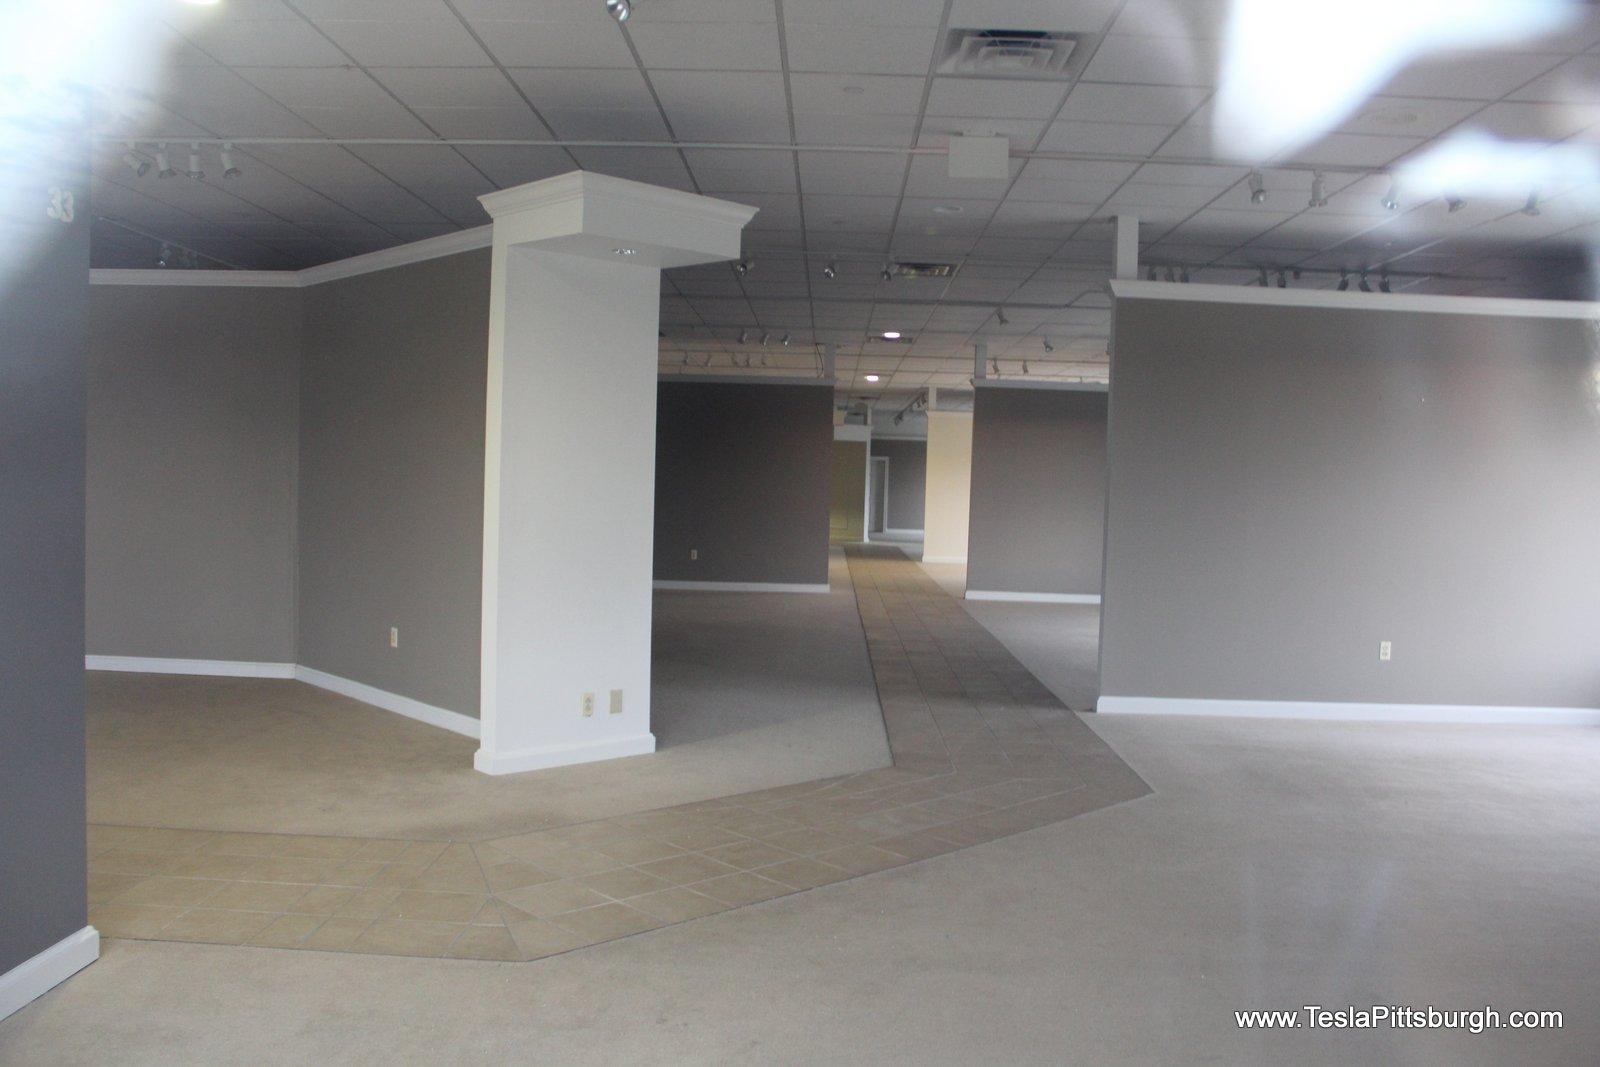 interior of unrenovated pittsburgh tesla service center 2